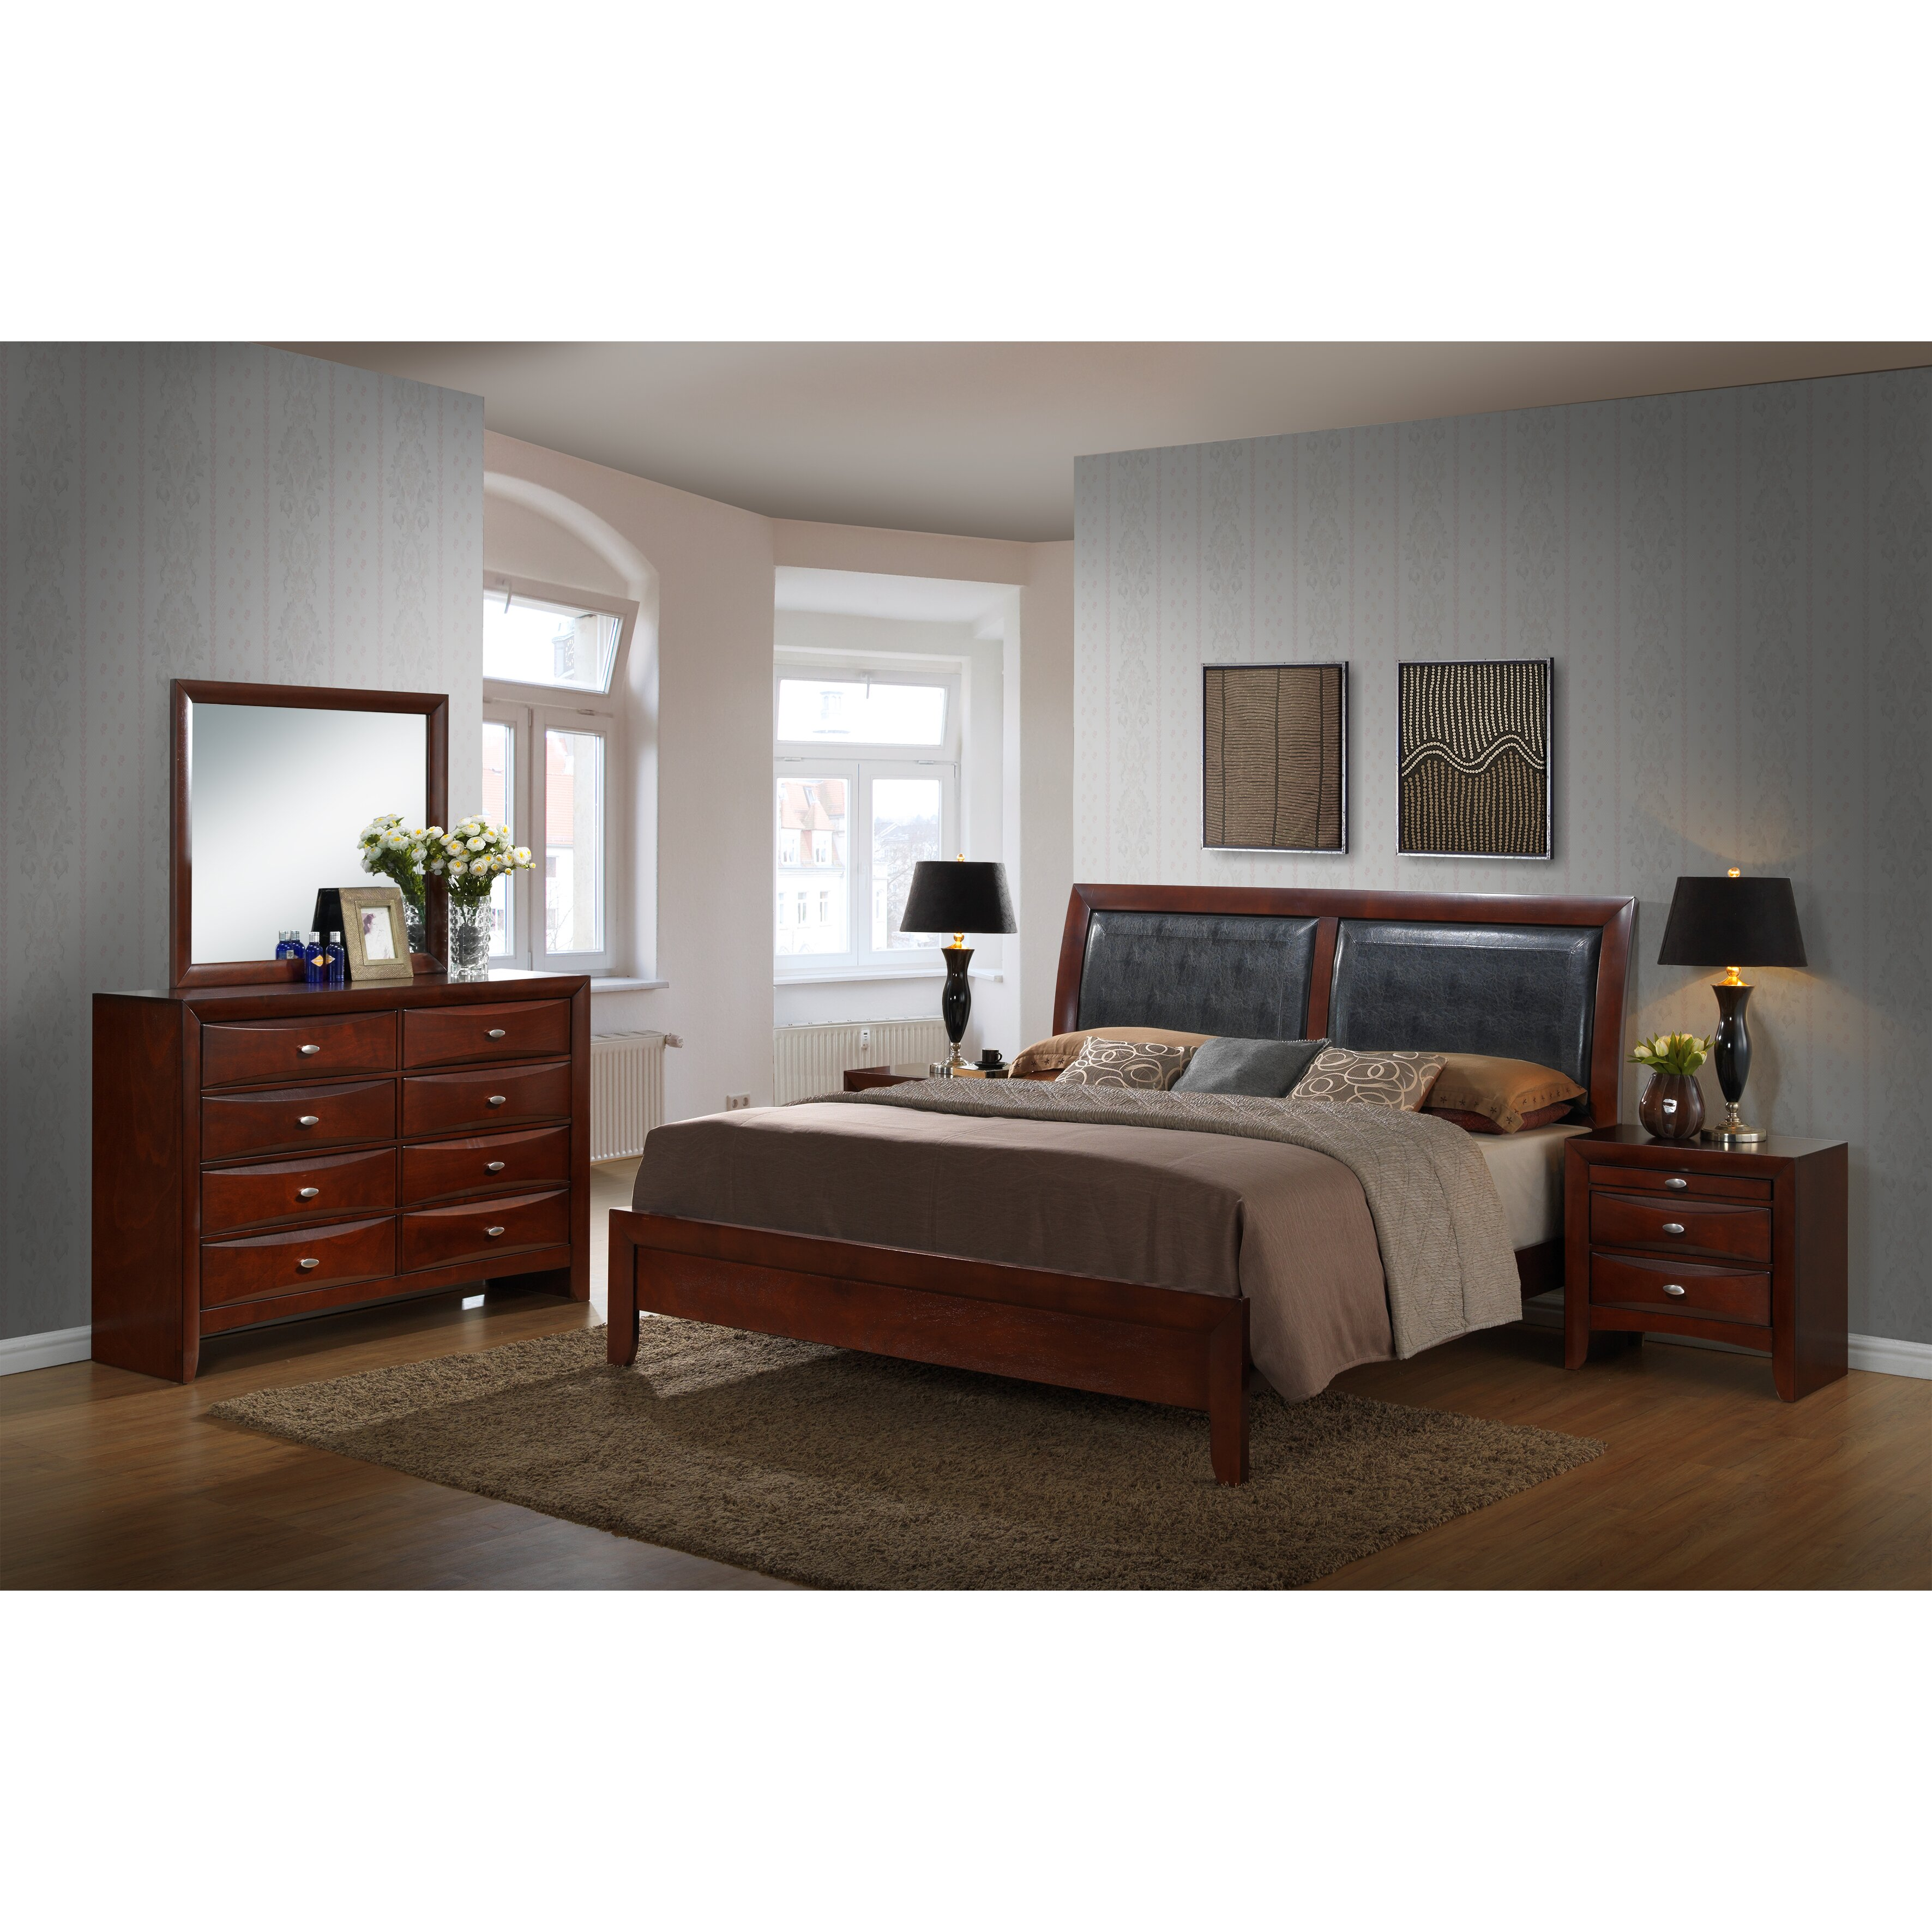 Roundhill furniture emily panel 5 piece bedroom set wayfair for Bedroom 5 piece sets